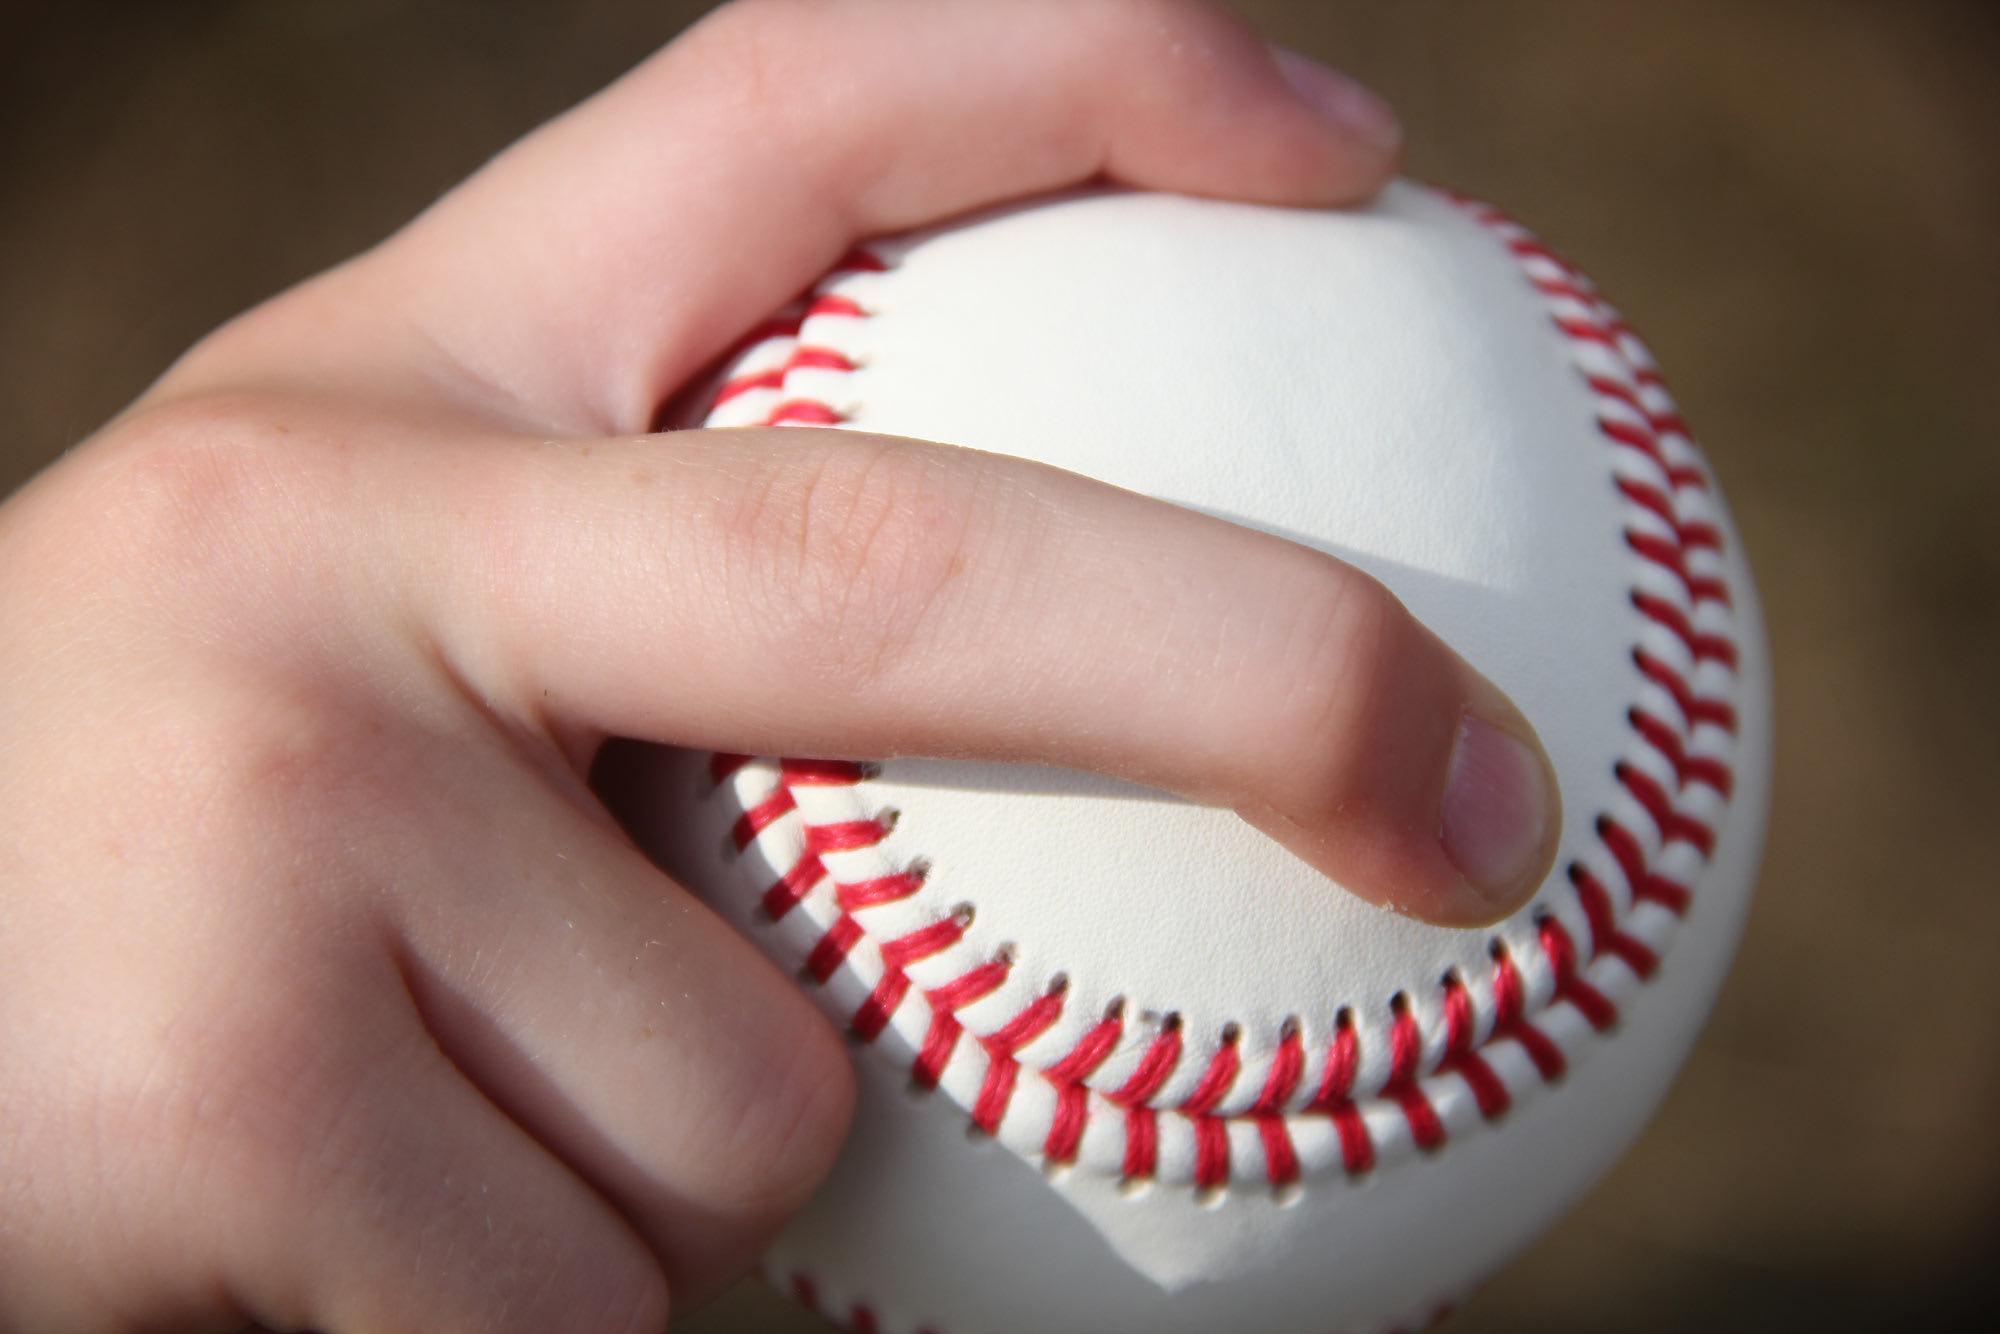 grip on ball